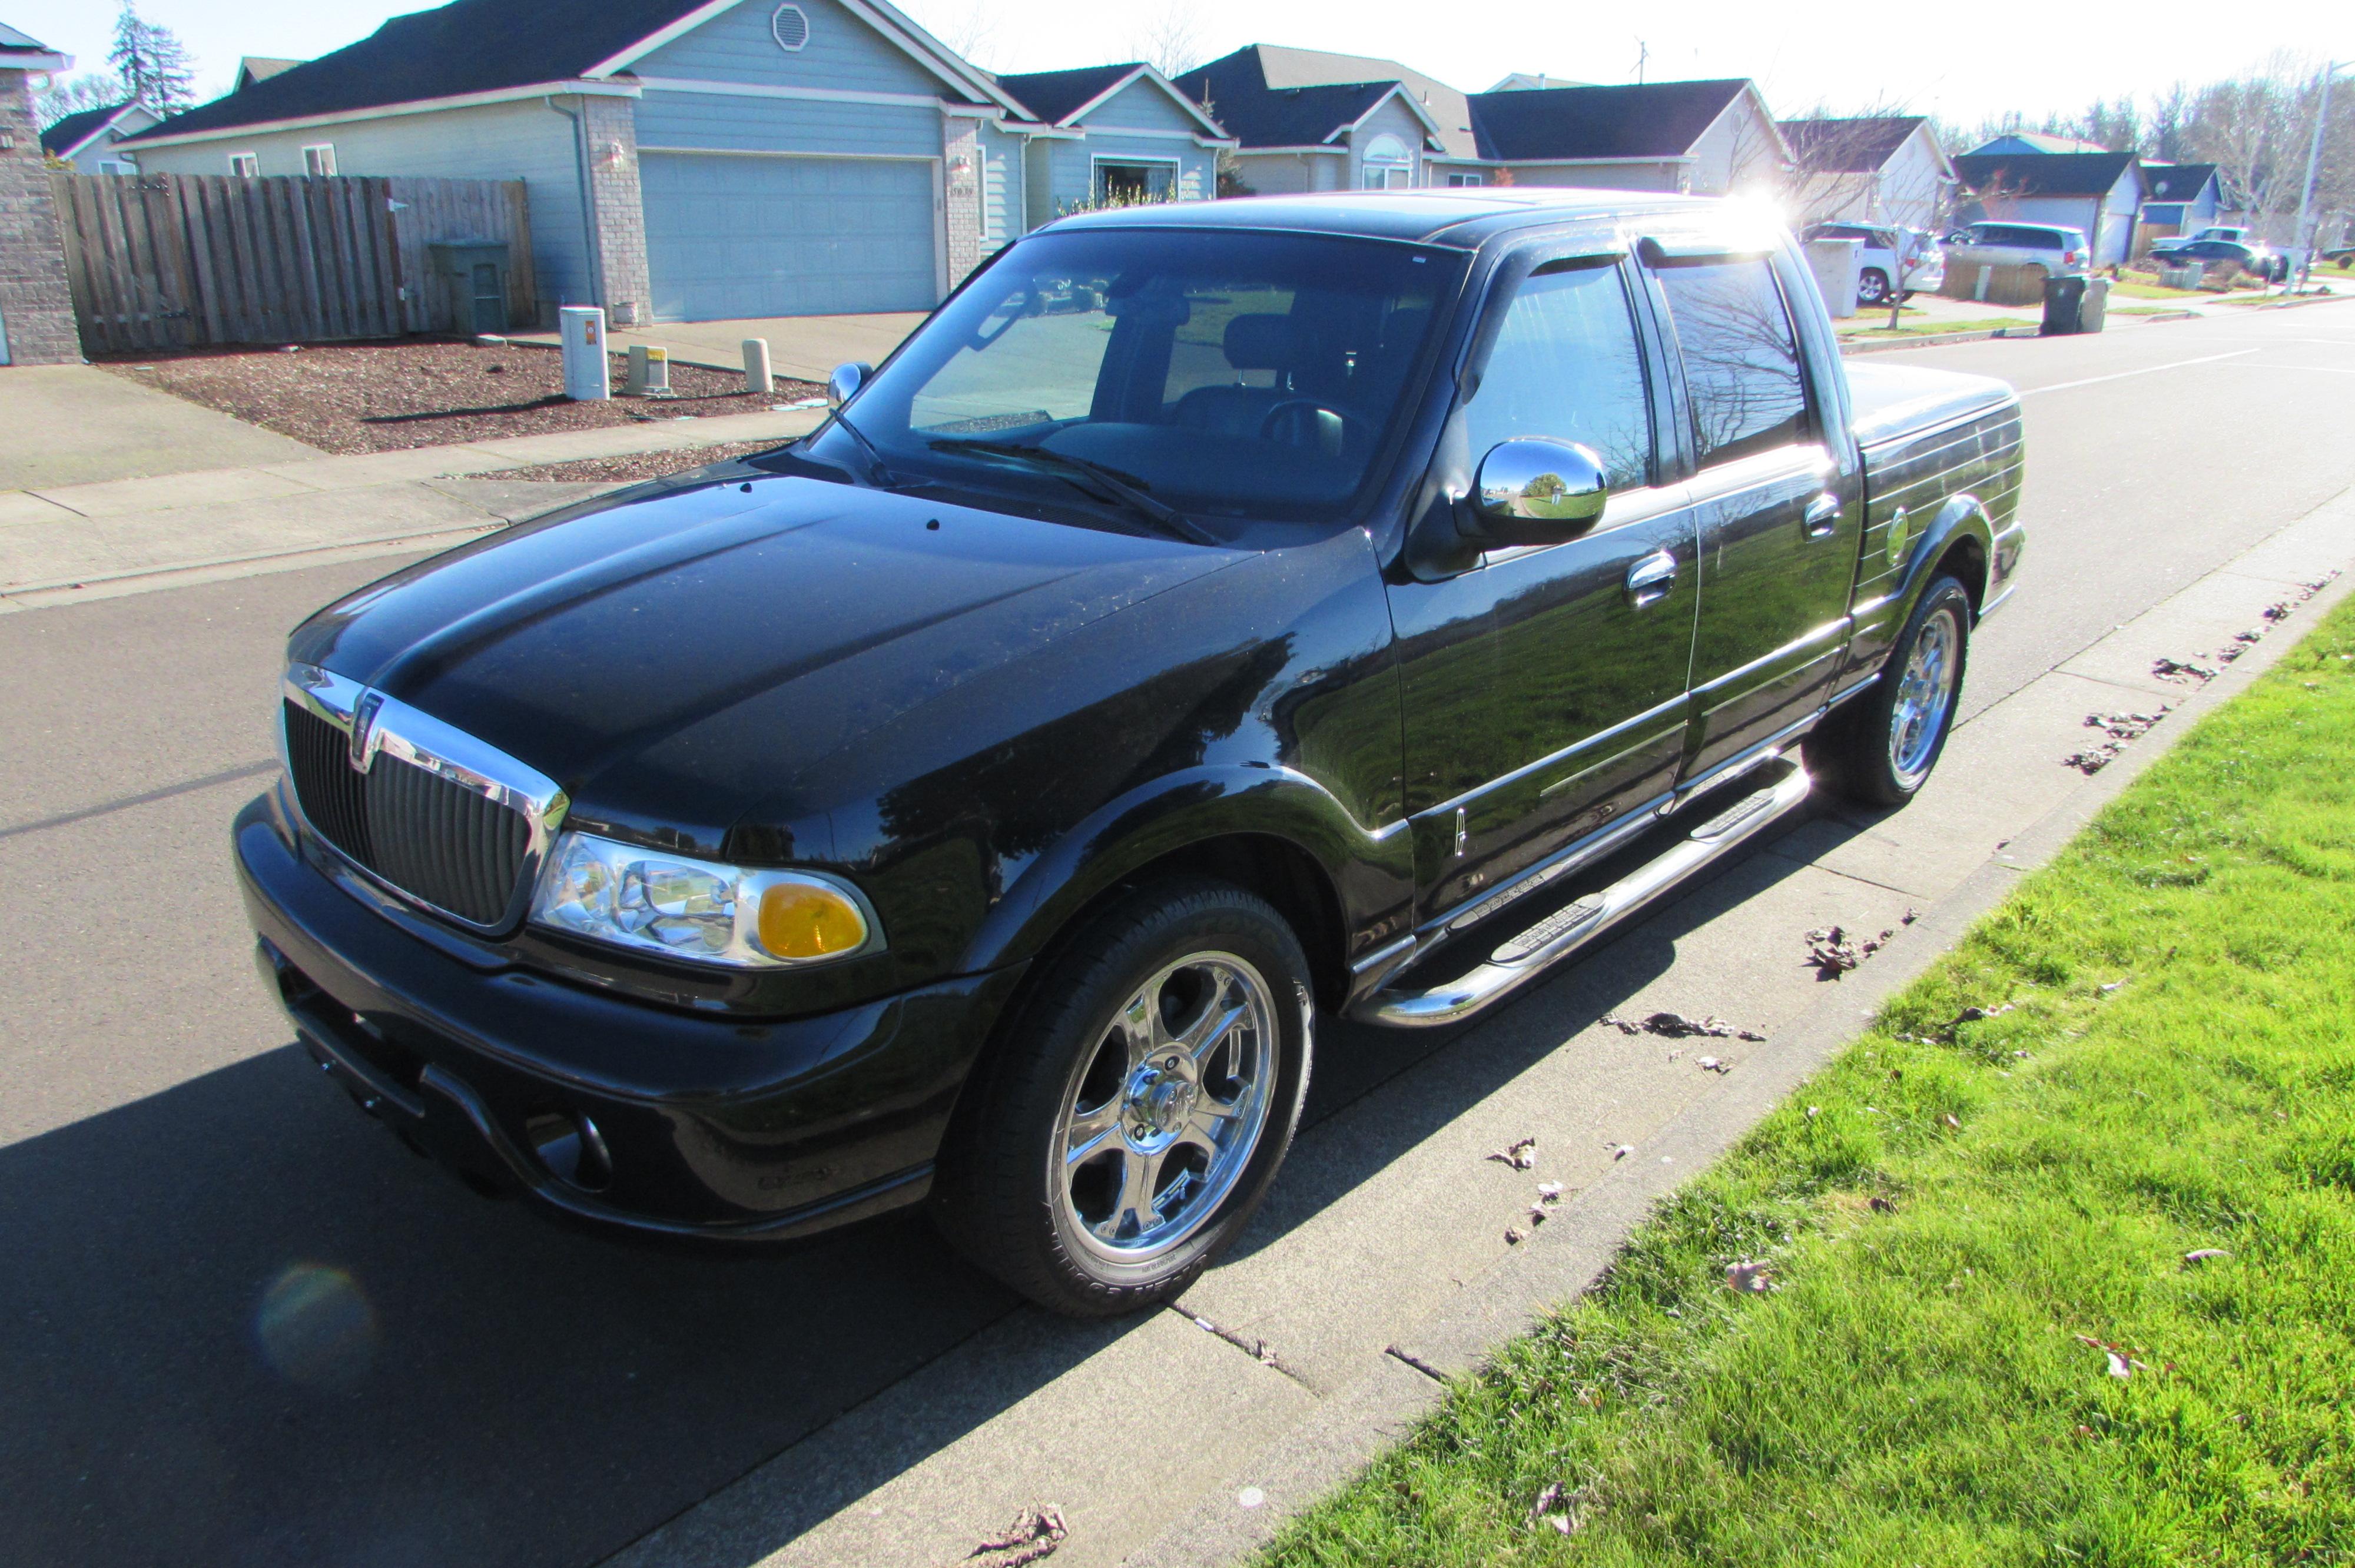 2002 Lincoln Blackwood  Pick Up